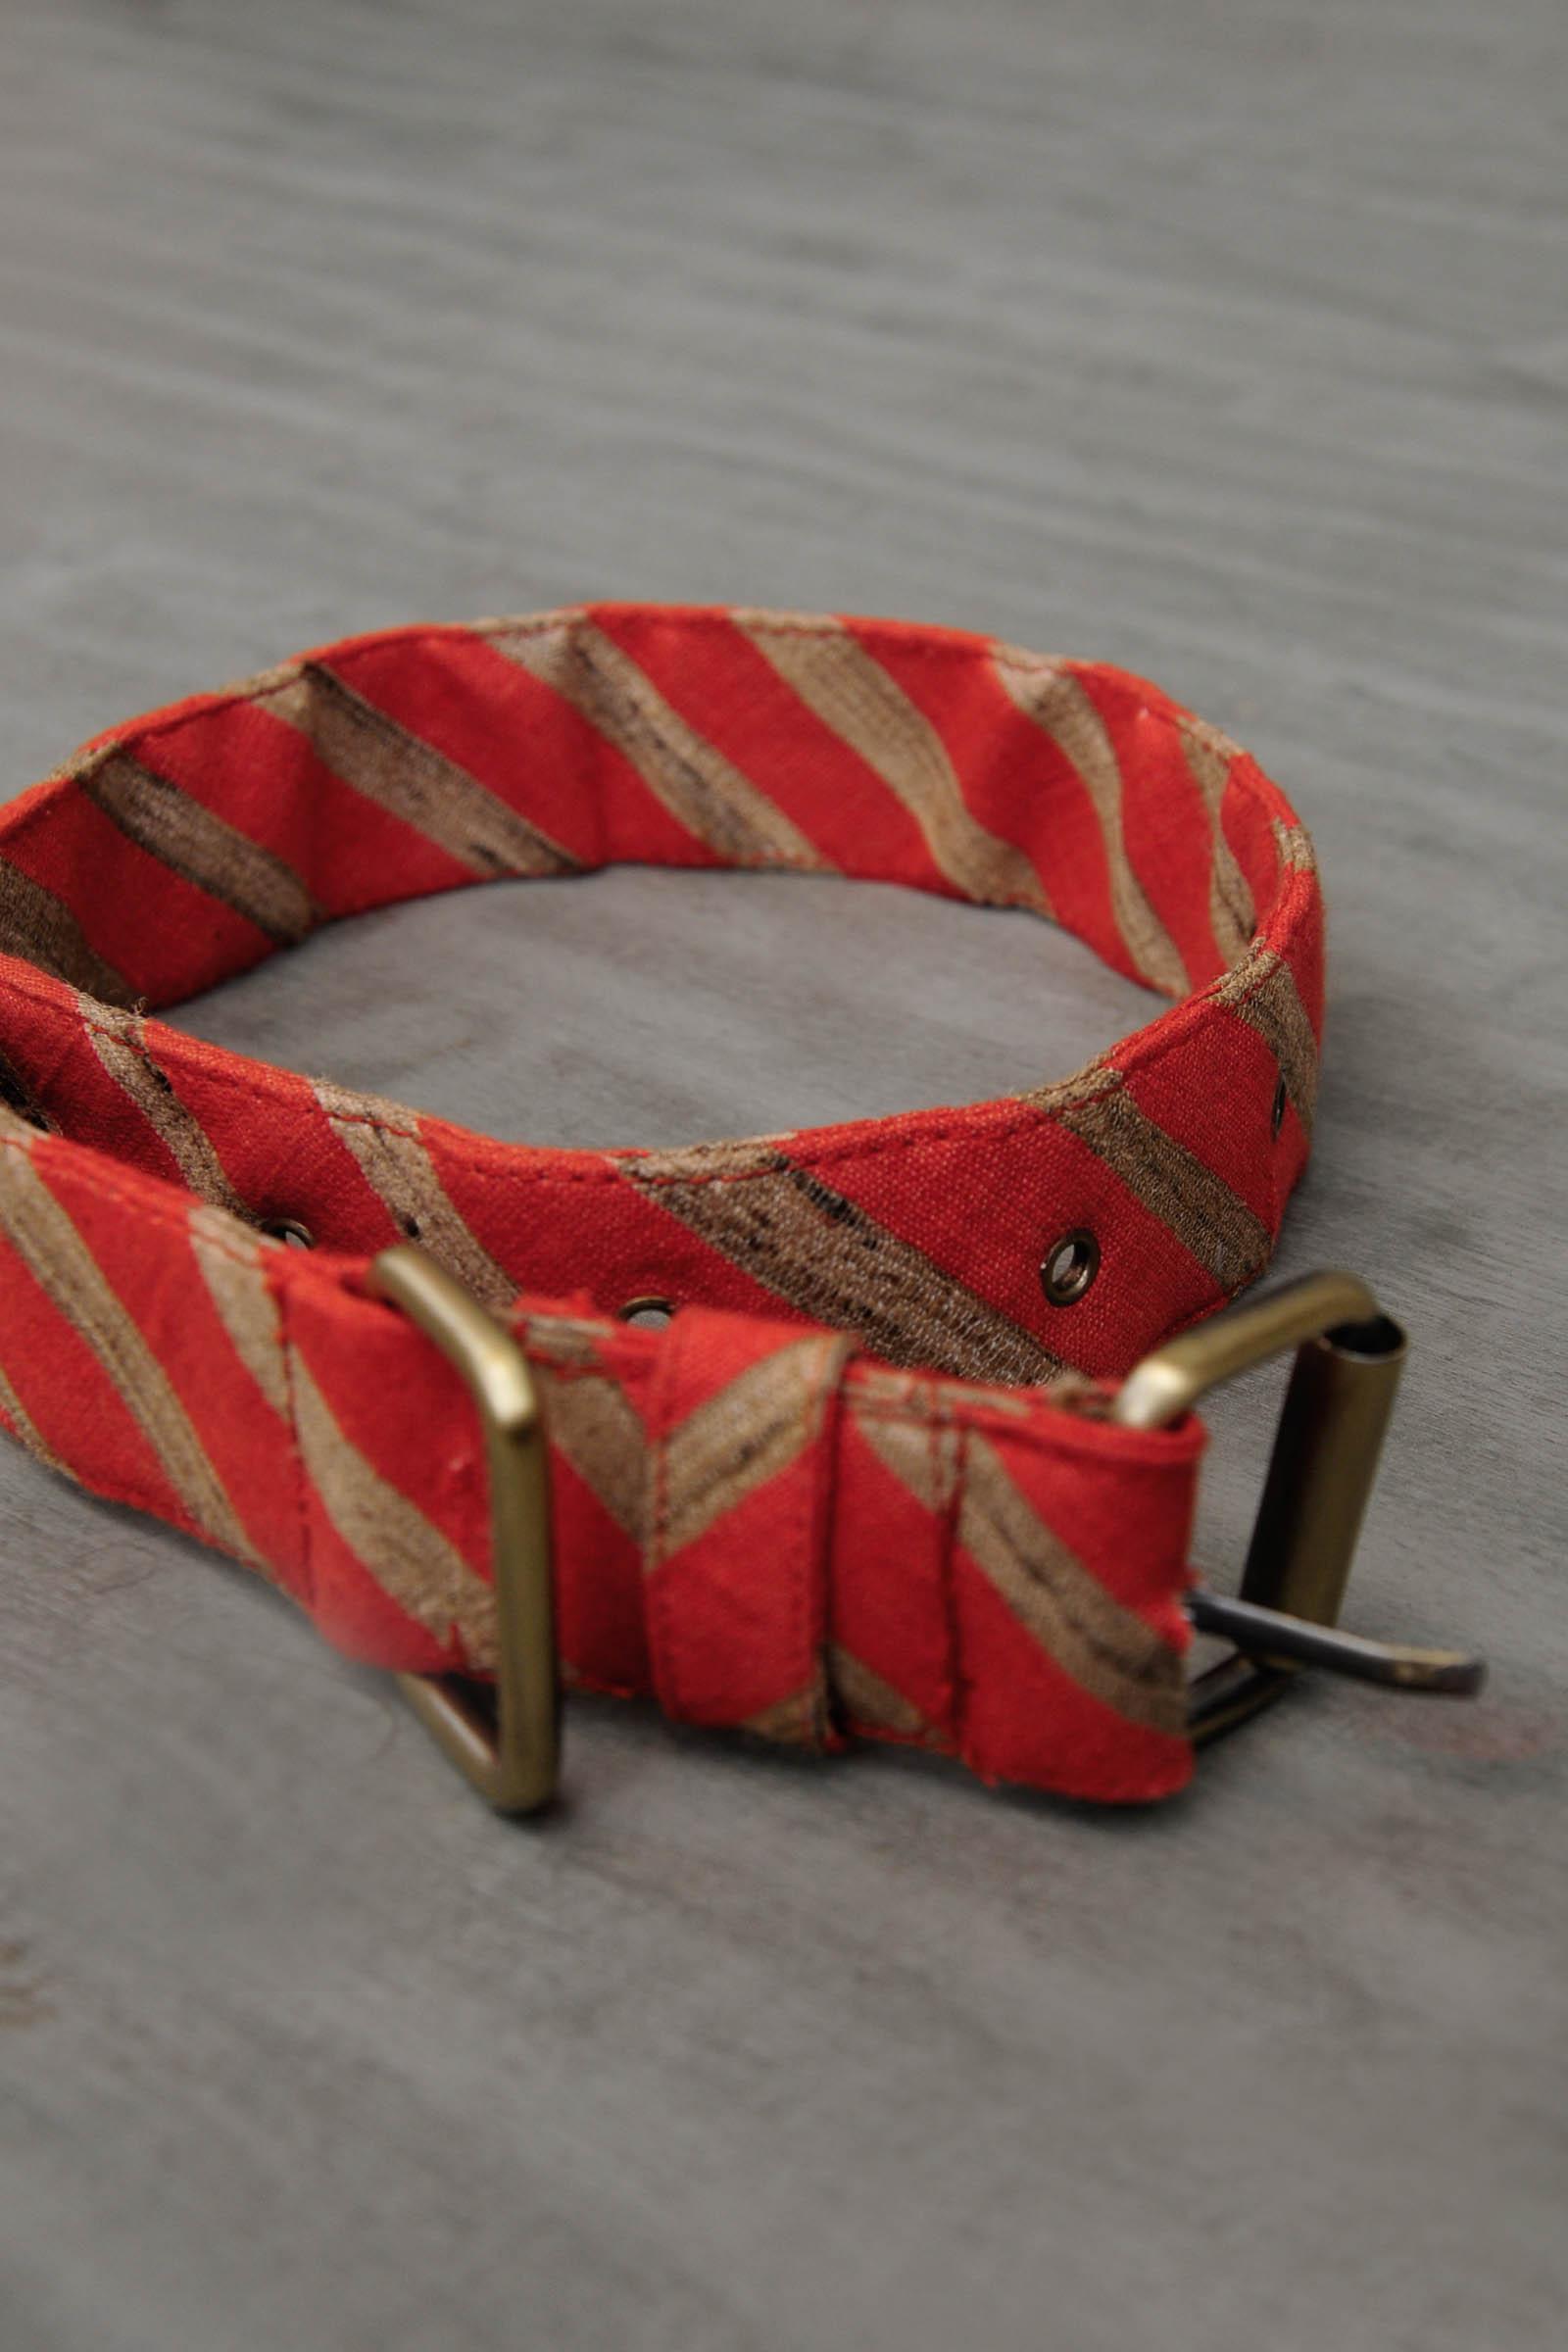 Stripe Collar-Red